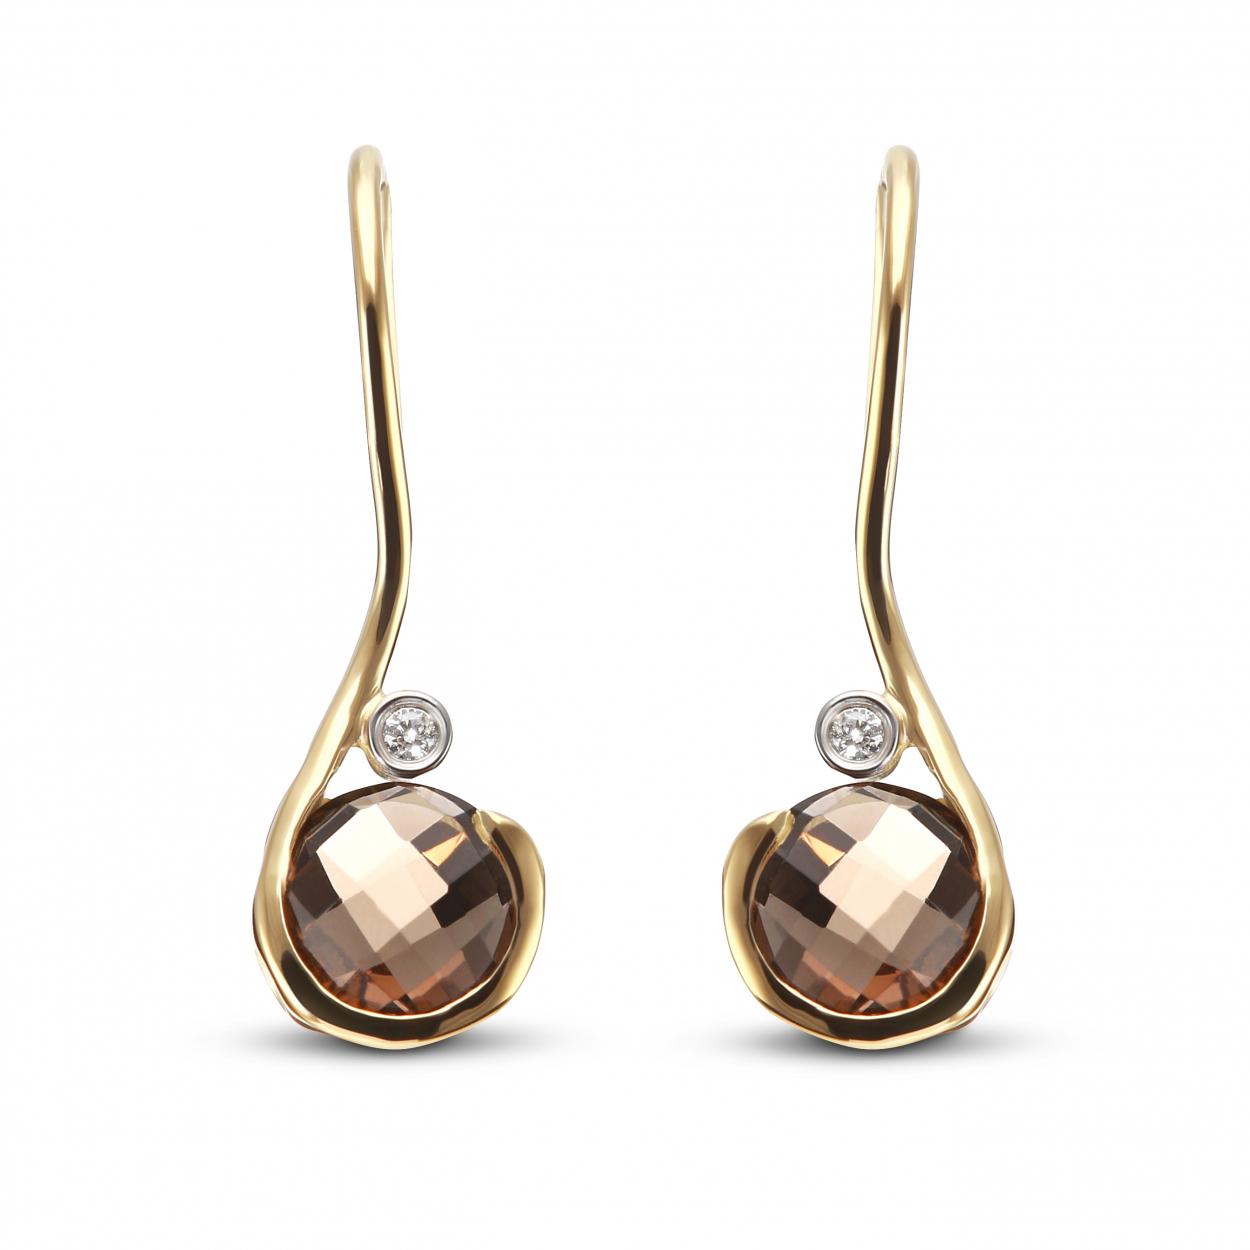 boucles d 39 oreilles pendantes or jaune quartz fum 6mm et diamant ref 37190. Black Bedroom Furniture Sets. Home Design Ideas